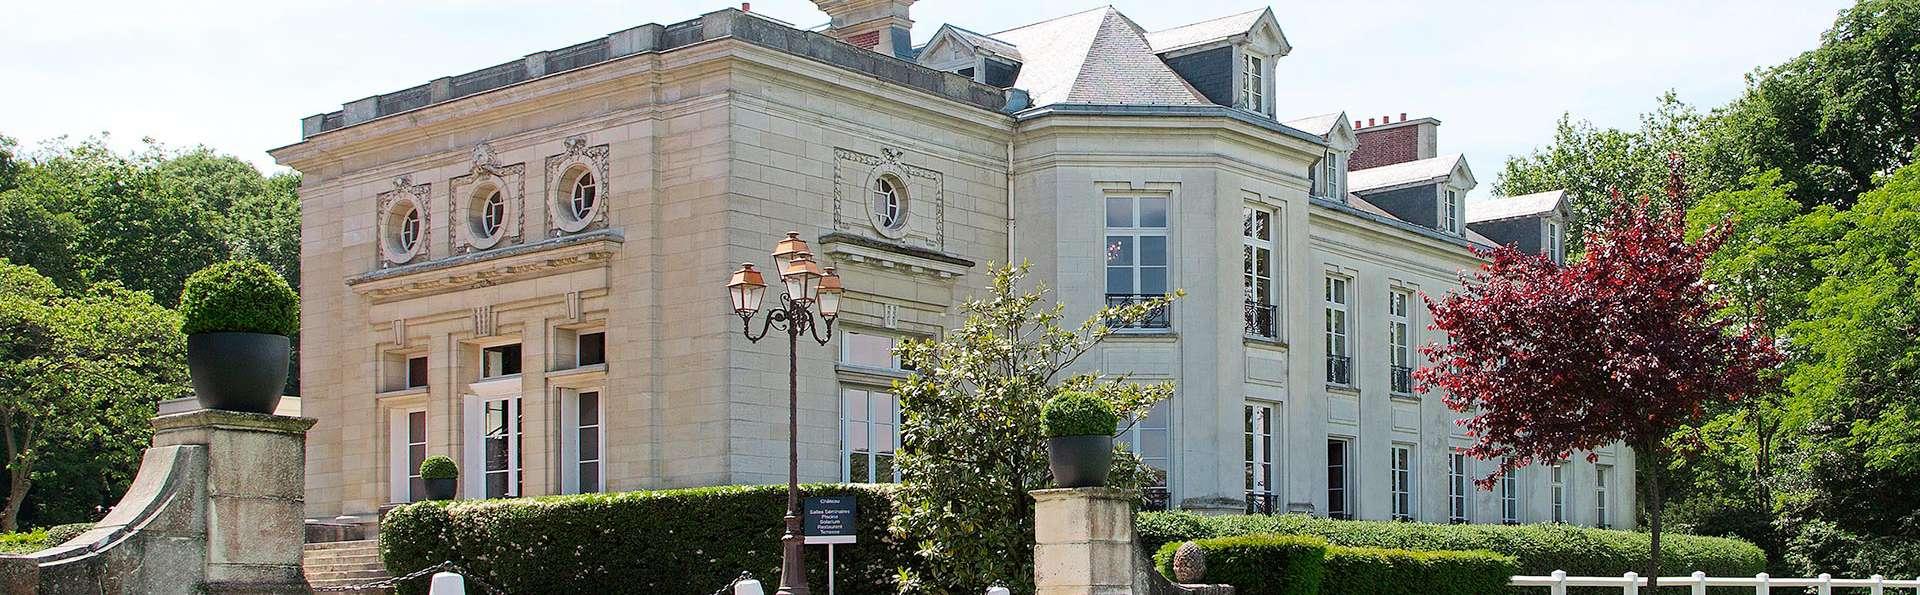 Novotel Château de Maffliers - edit_facade5.jpg